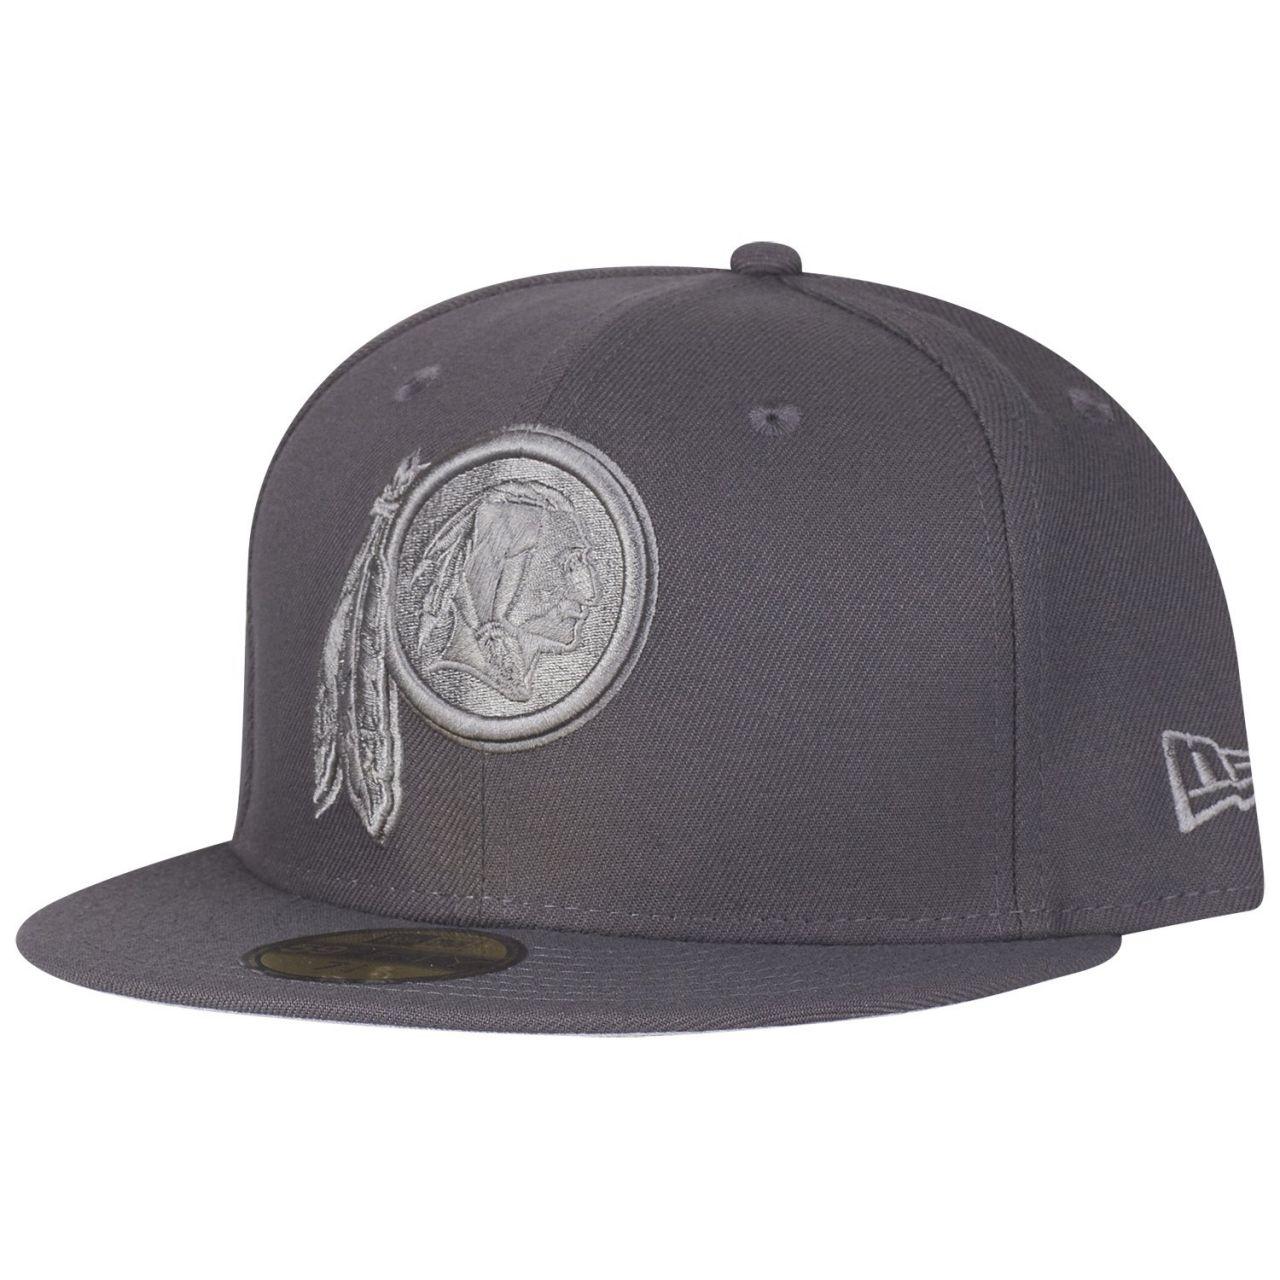 amfoo - New Era 59Fifty Cap - GRAPHITE Washington Redskins